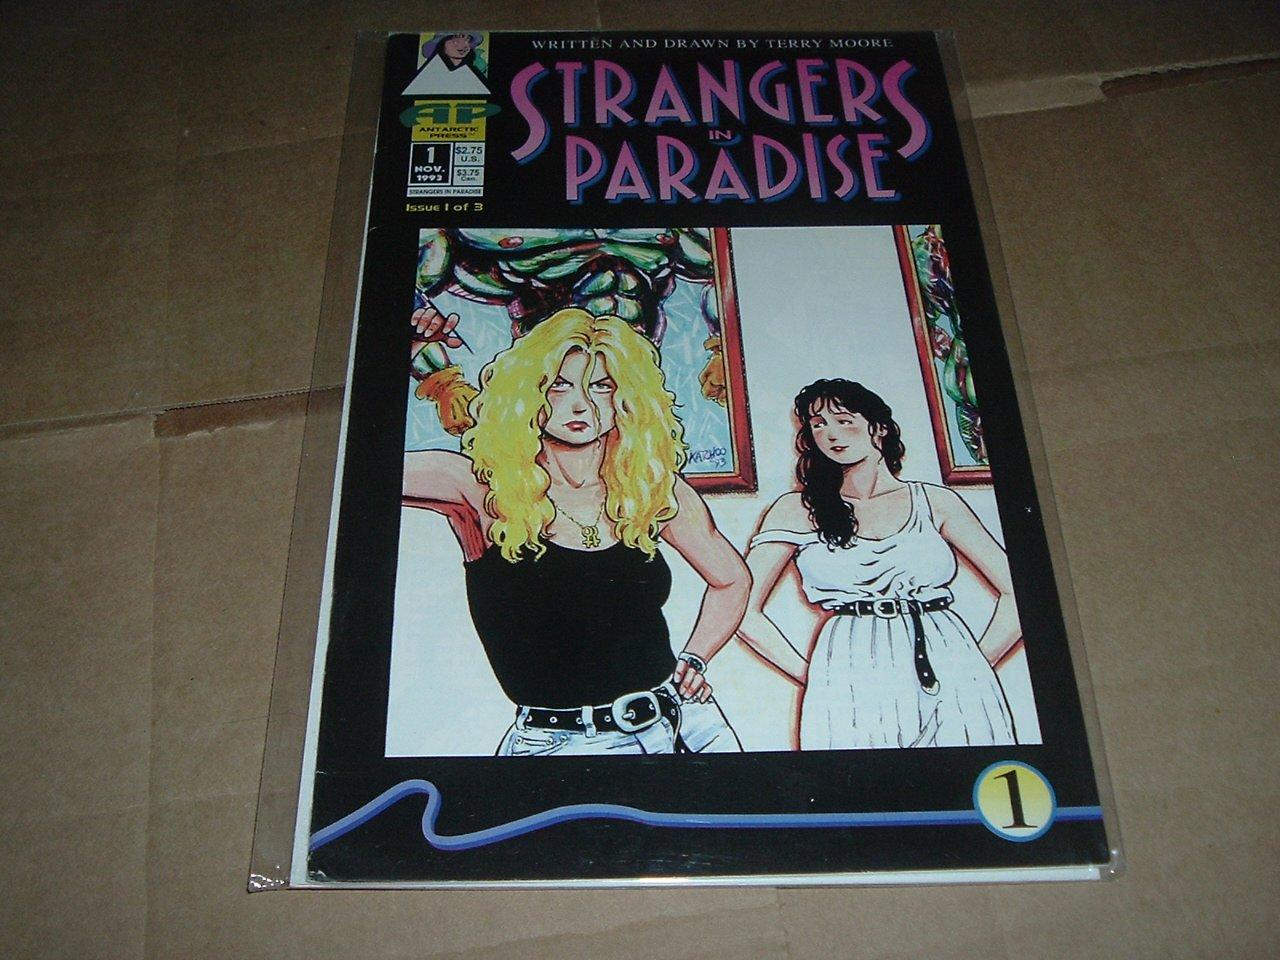 Strangers in Paradise #1 (Vol. 1) Original Mini-series, VERY FINE Terry Moore (Antarctic Press 1993)